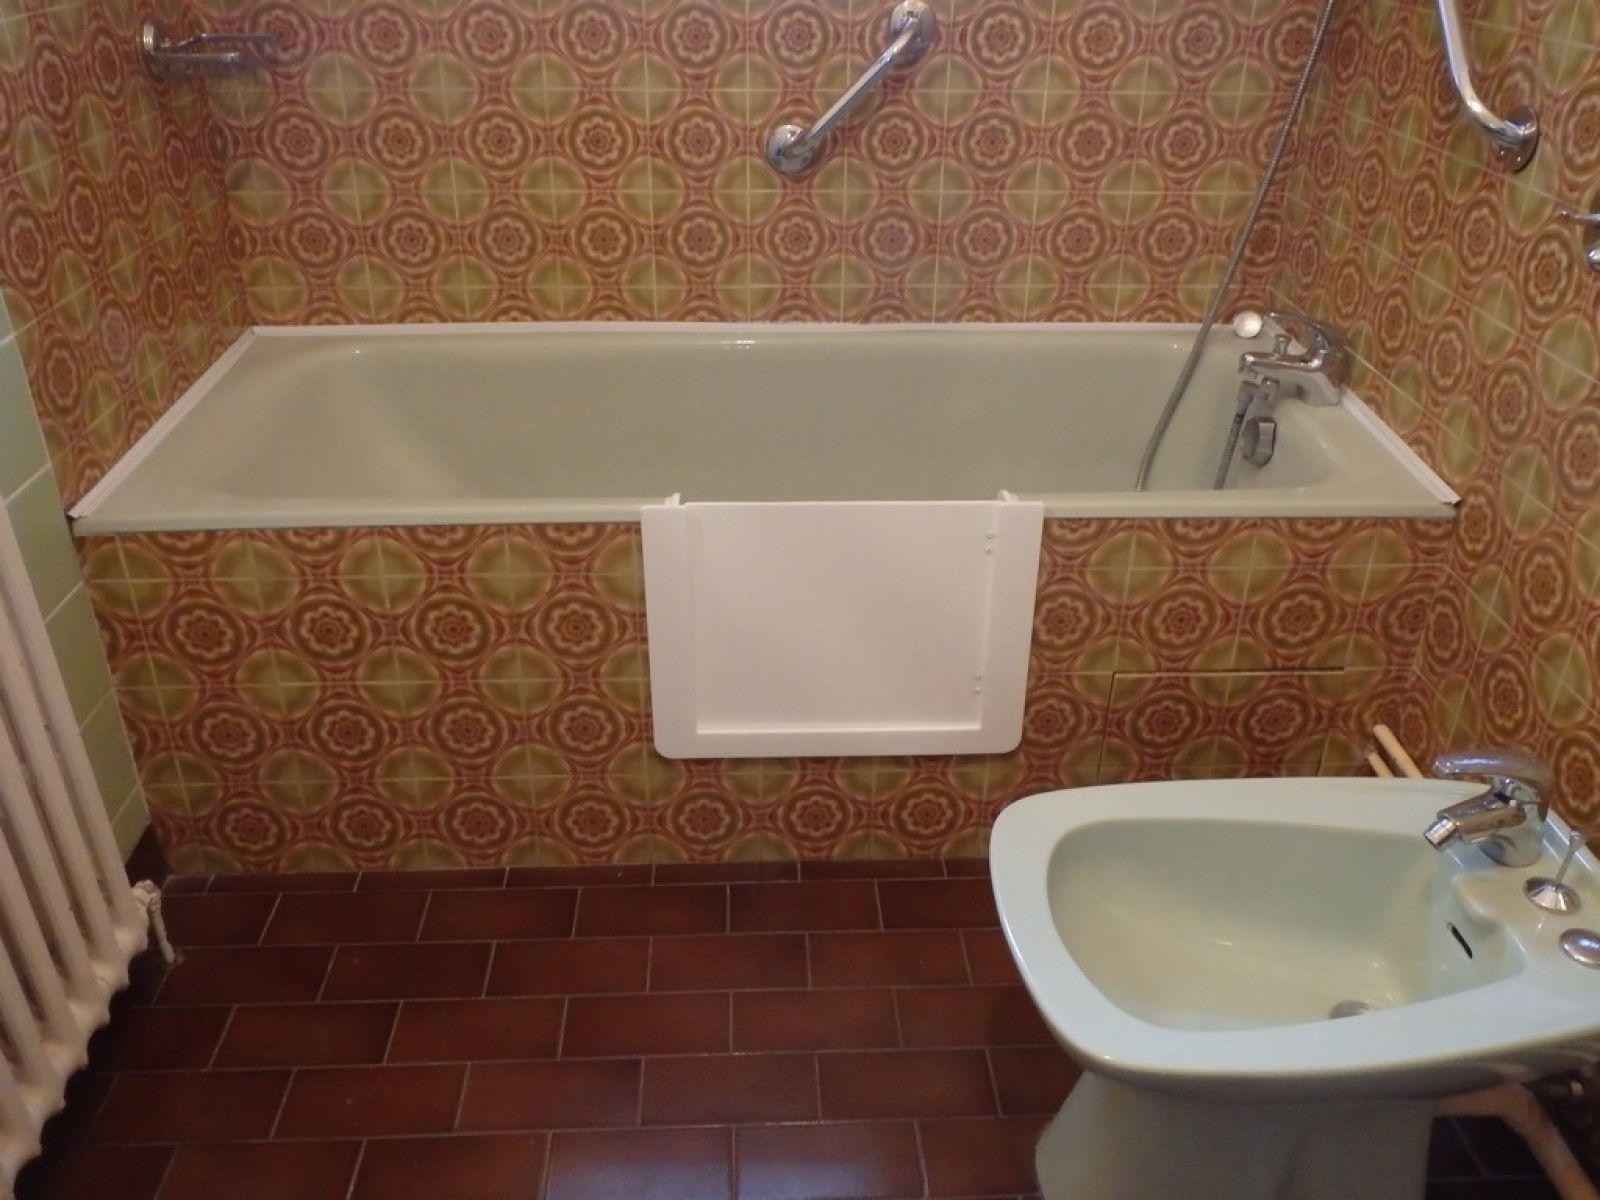 Transformer une baignoire en bassin beautiful pied pieds Transformer une baignoire en baignoire a porte